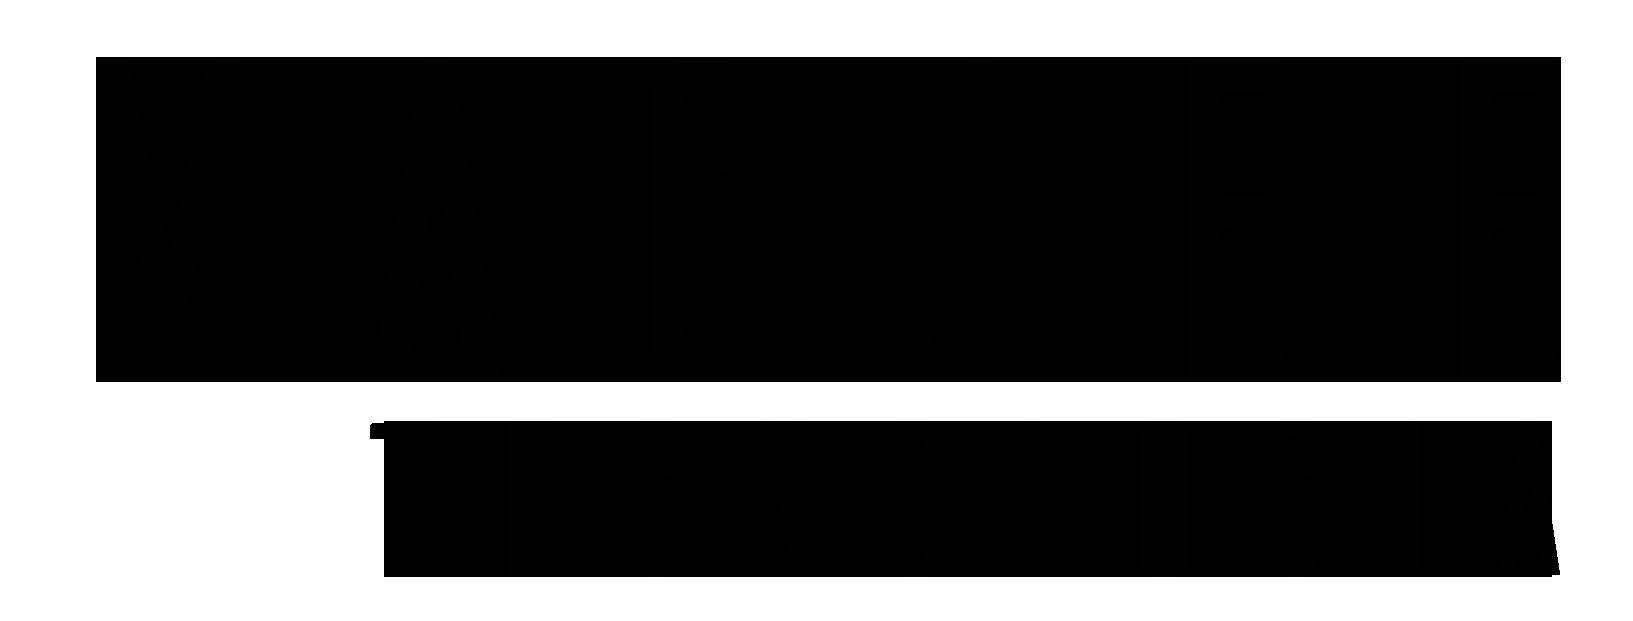 Logotipo preto Mac Jee Tecnologia